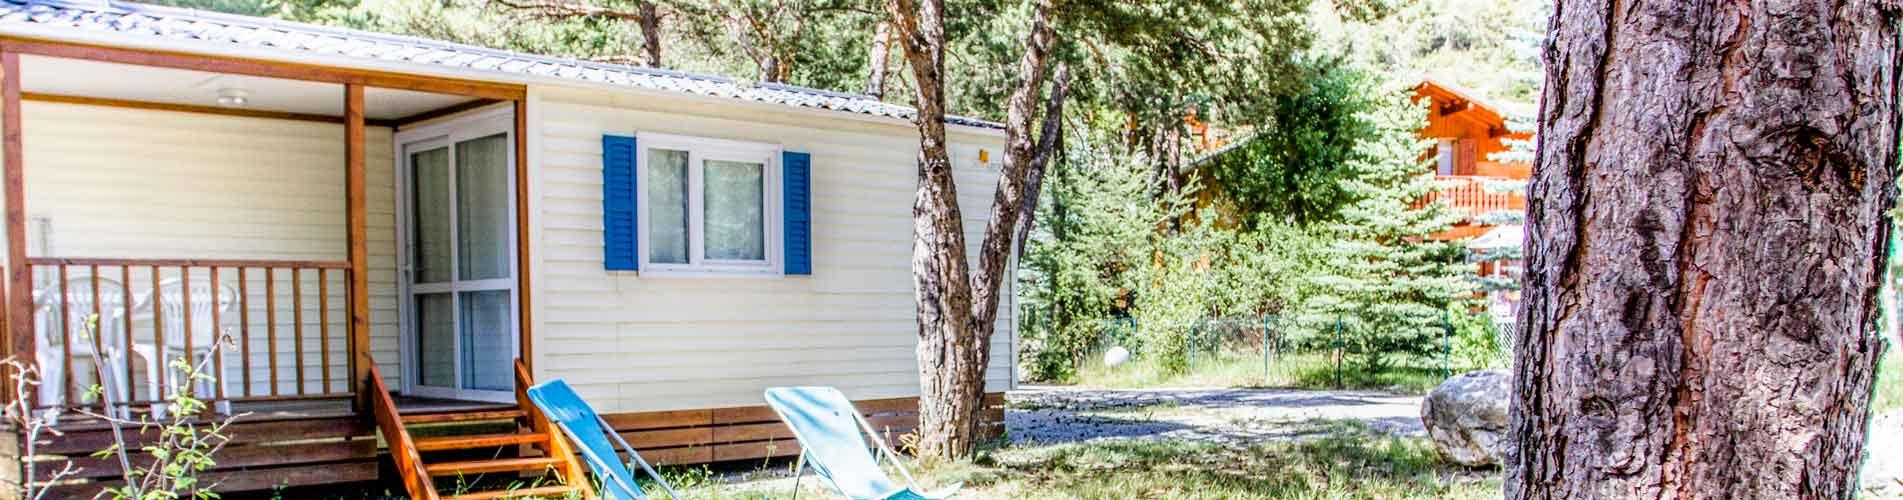 location cottage mediterraneen camping paca